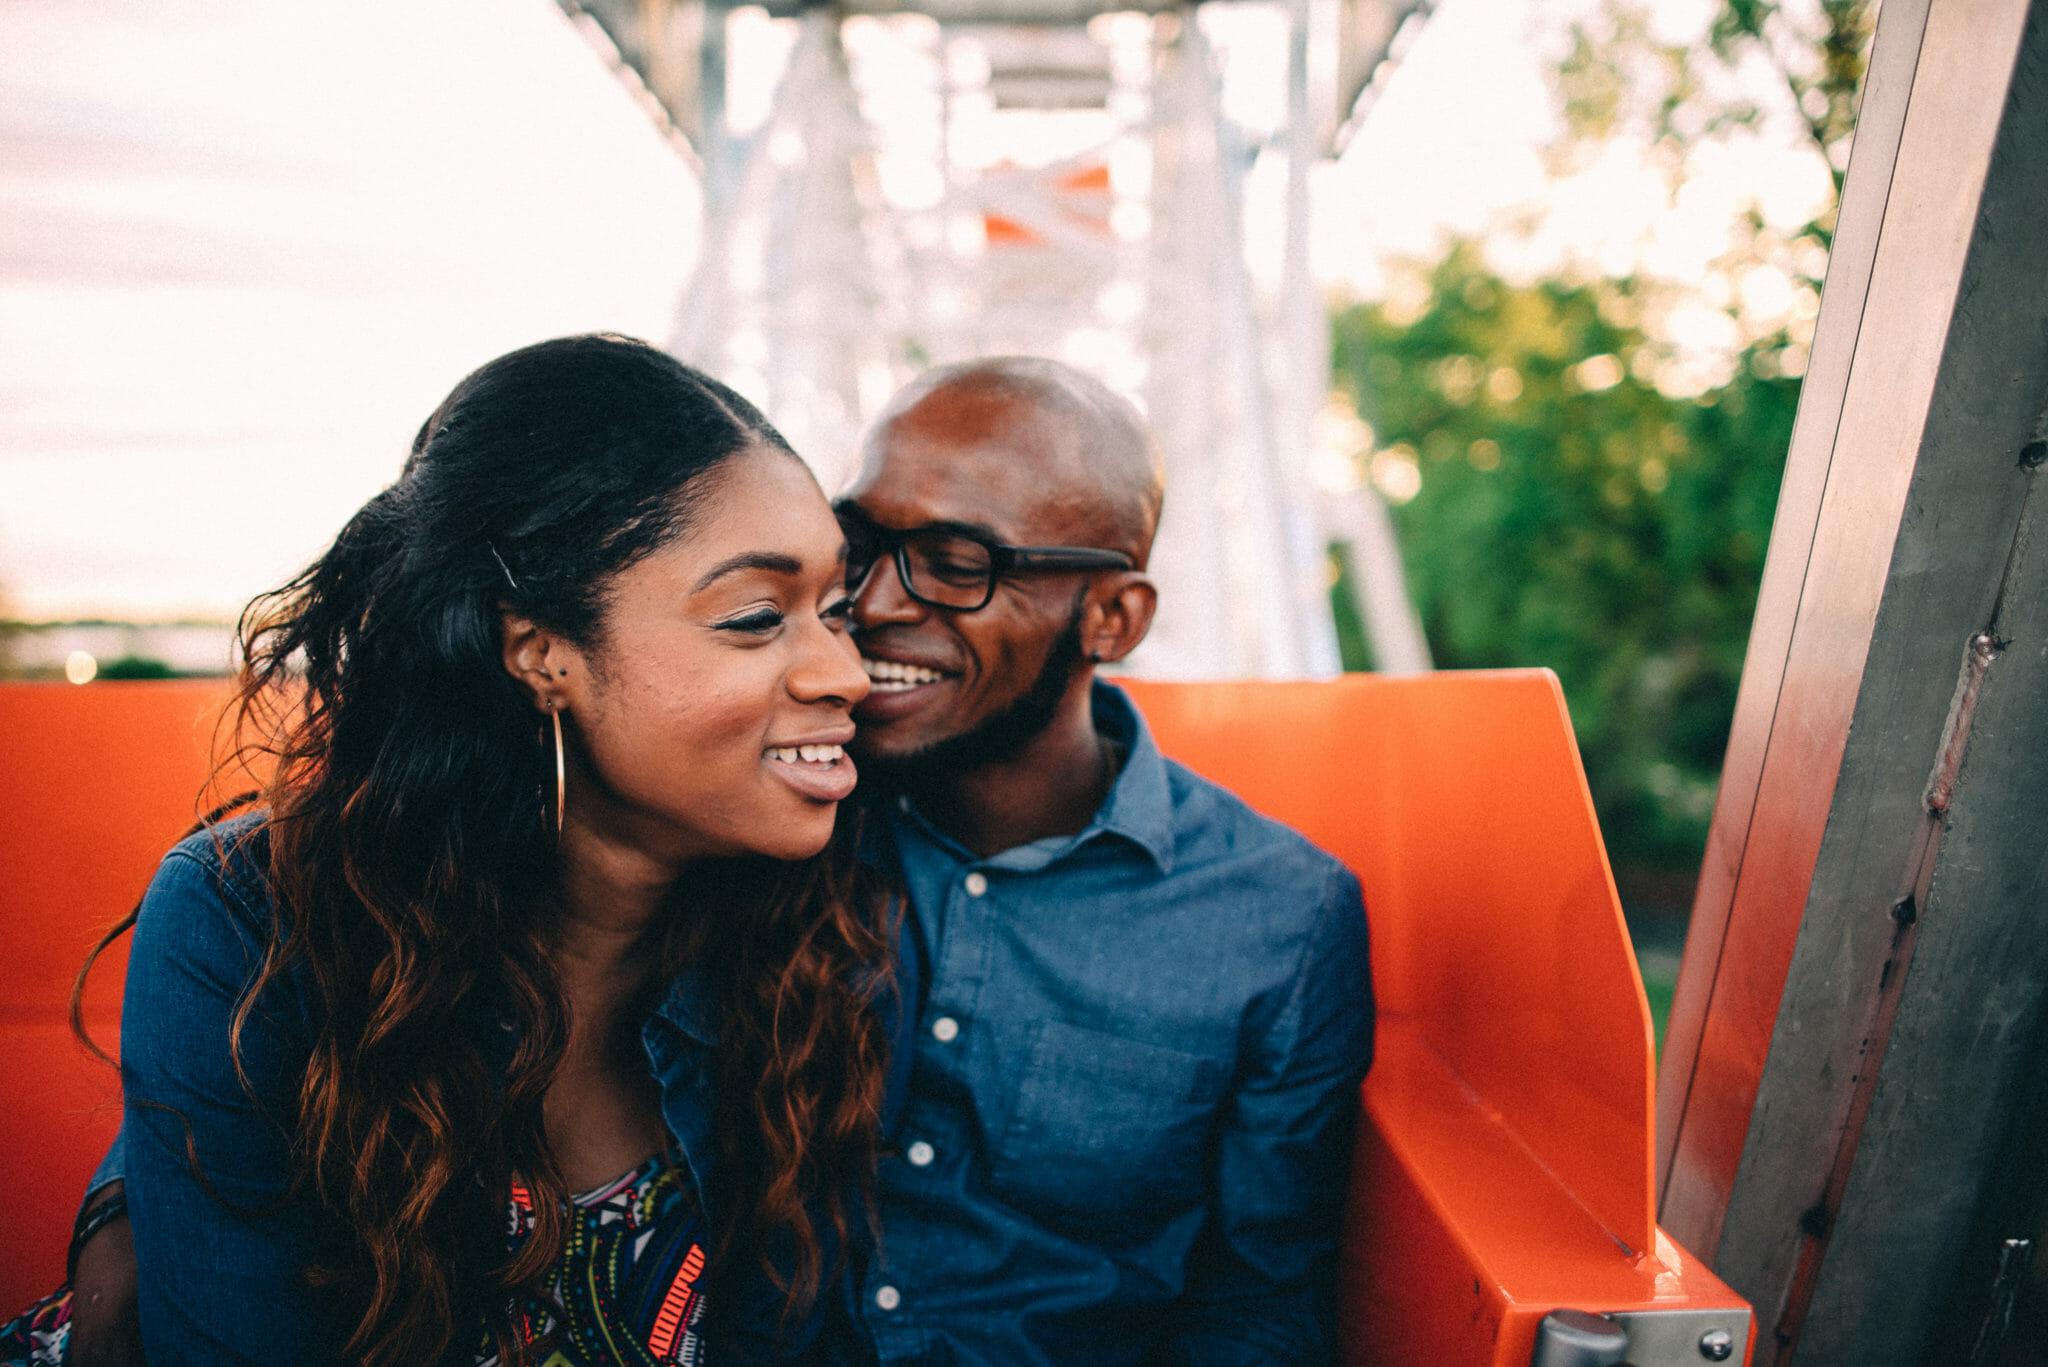 couple laugh on ferris wheel